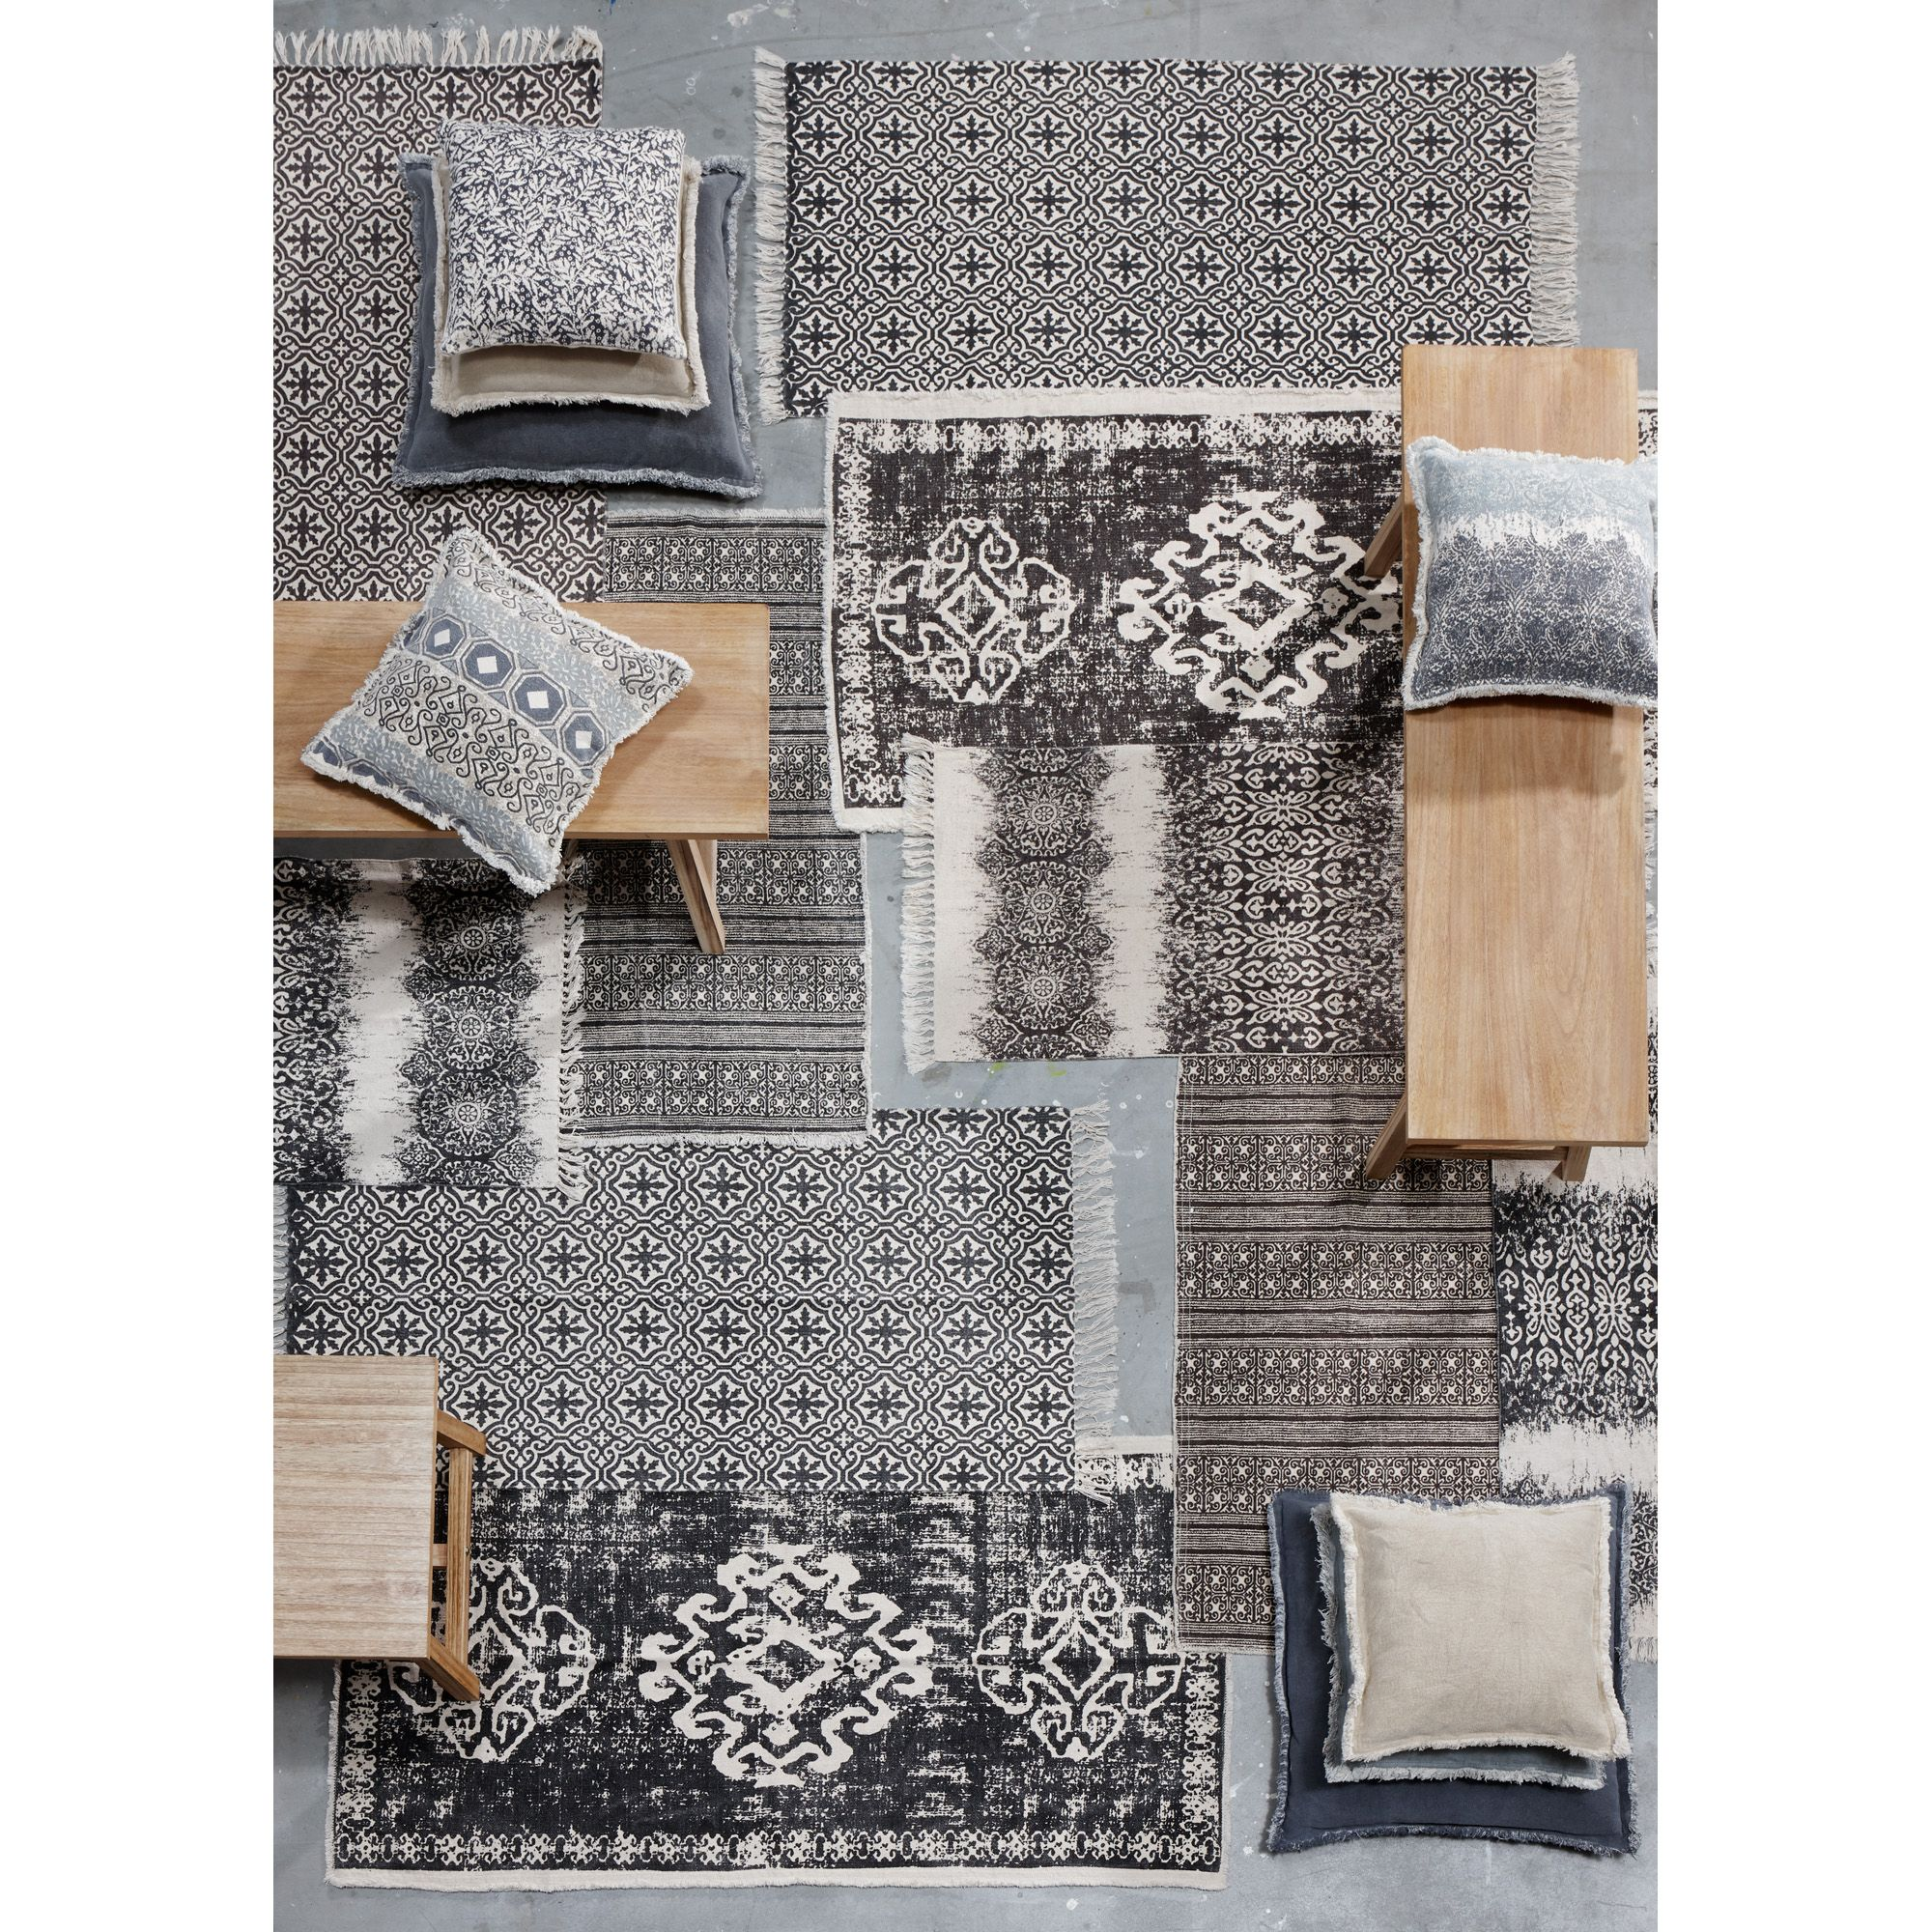 Vloerkleden in de leukste prints! #vloerkleed #woonkamer #interieur ...